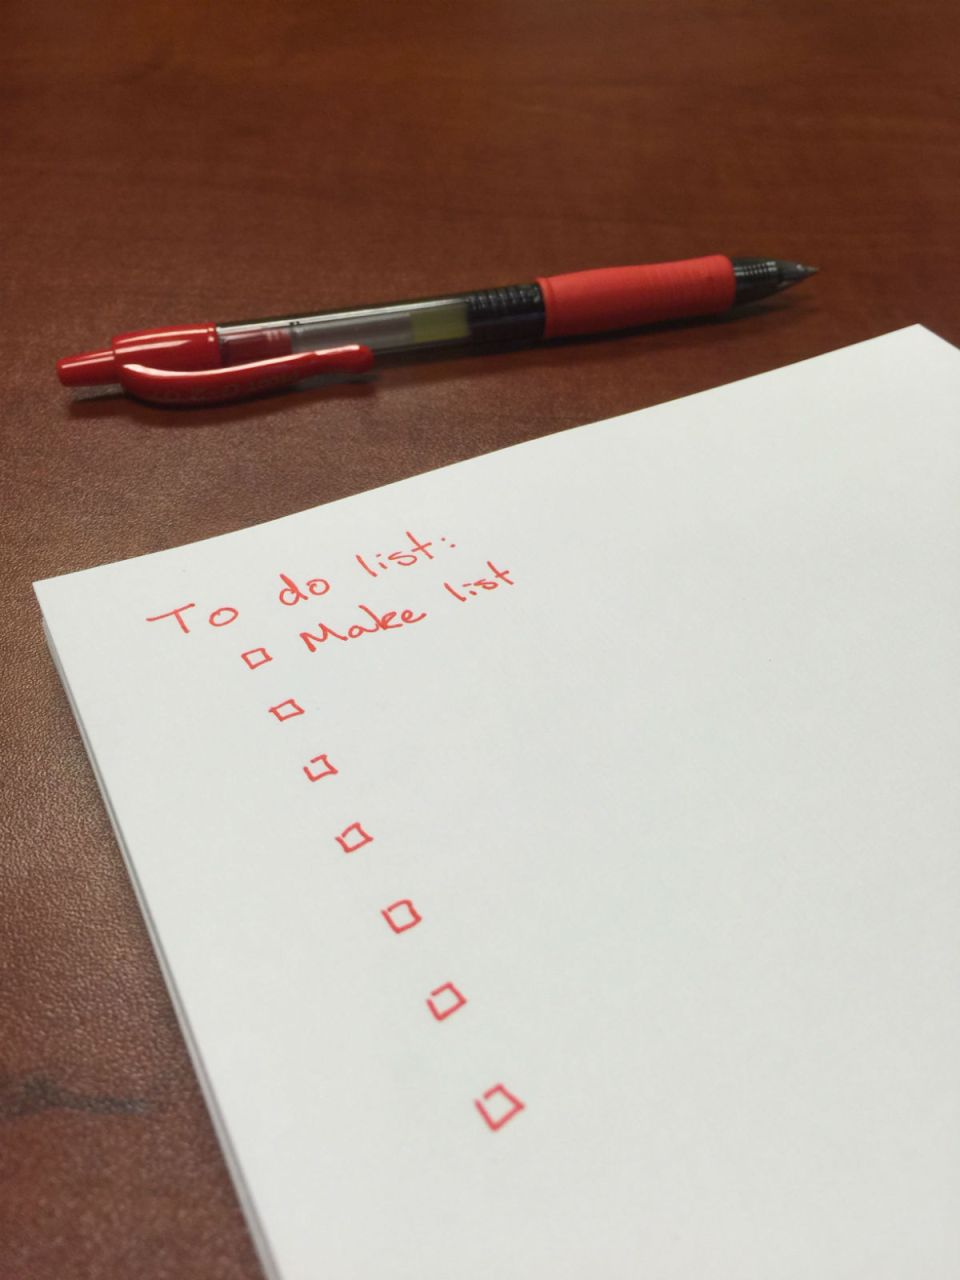 An empty to do list on a desk (Adam Diaz/wiki commons)